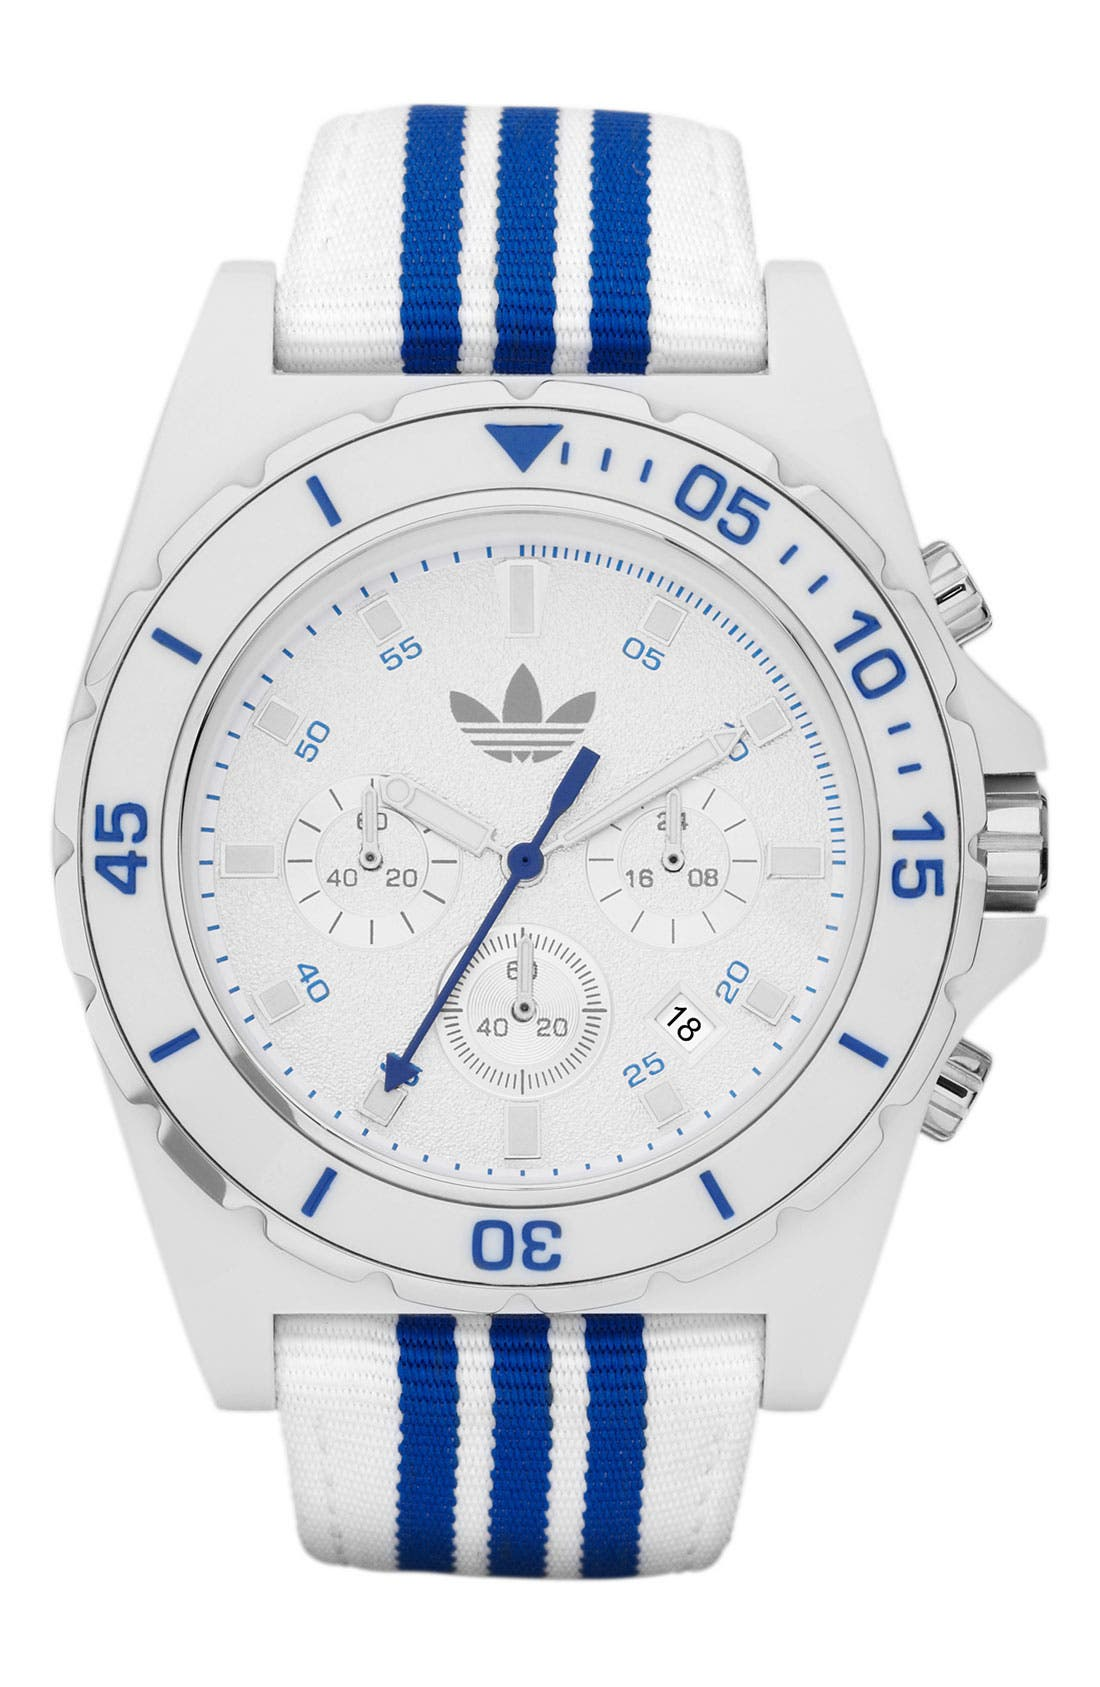 Main Image - adidas Originals 'Stockholm' Nylon Strap Watch, 44mm